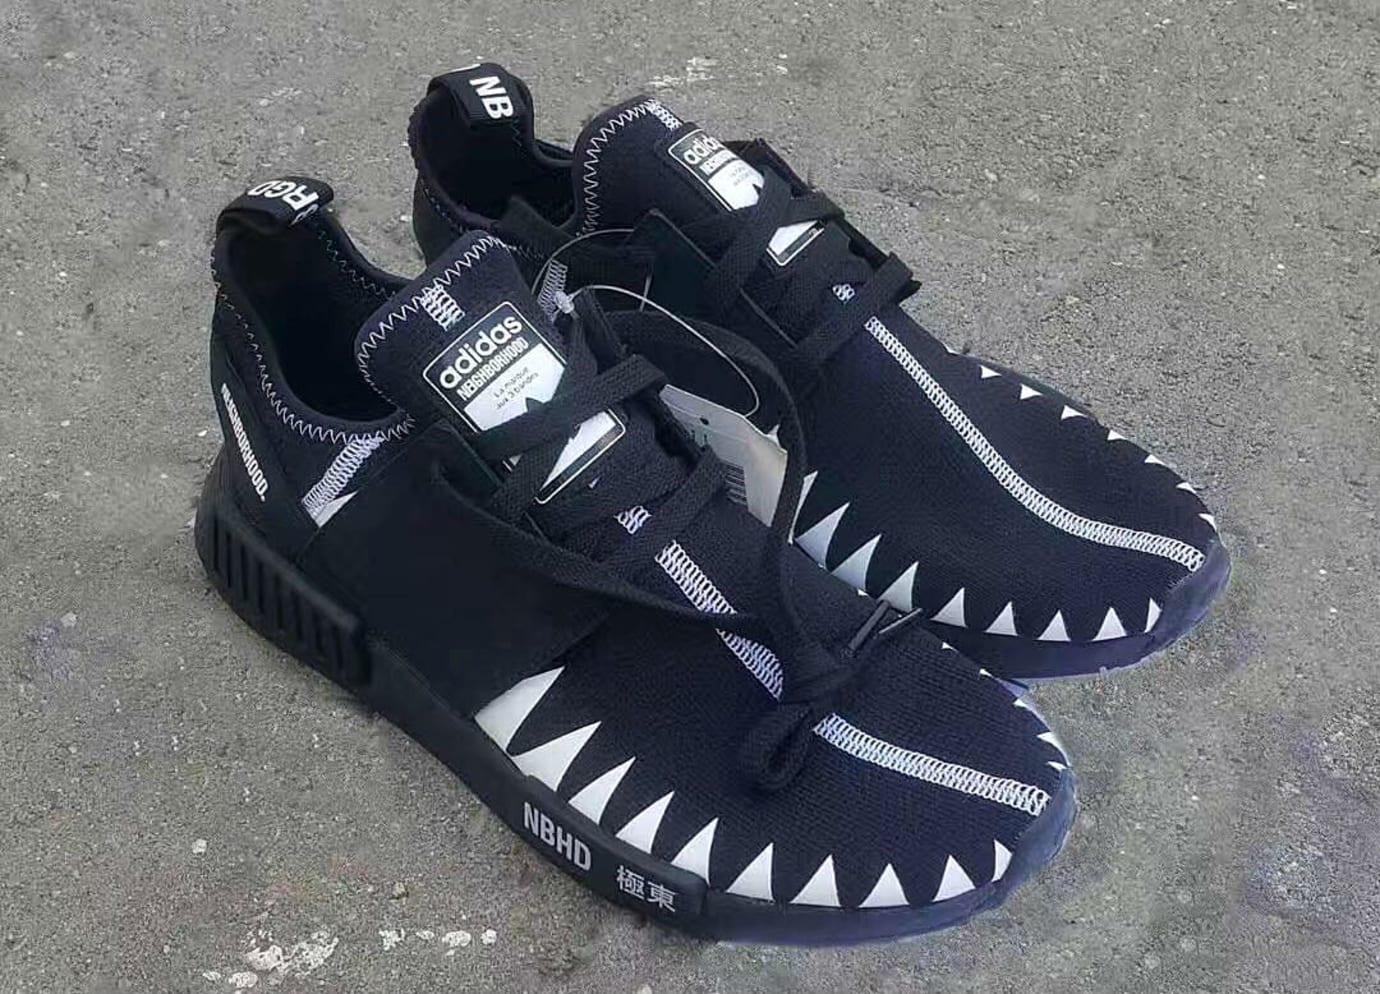 Neighborhood x Adidas NMD Black